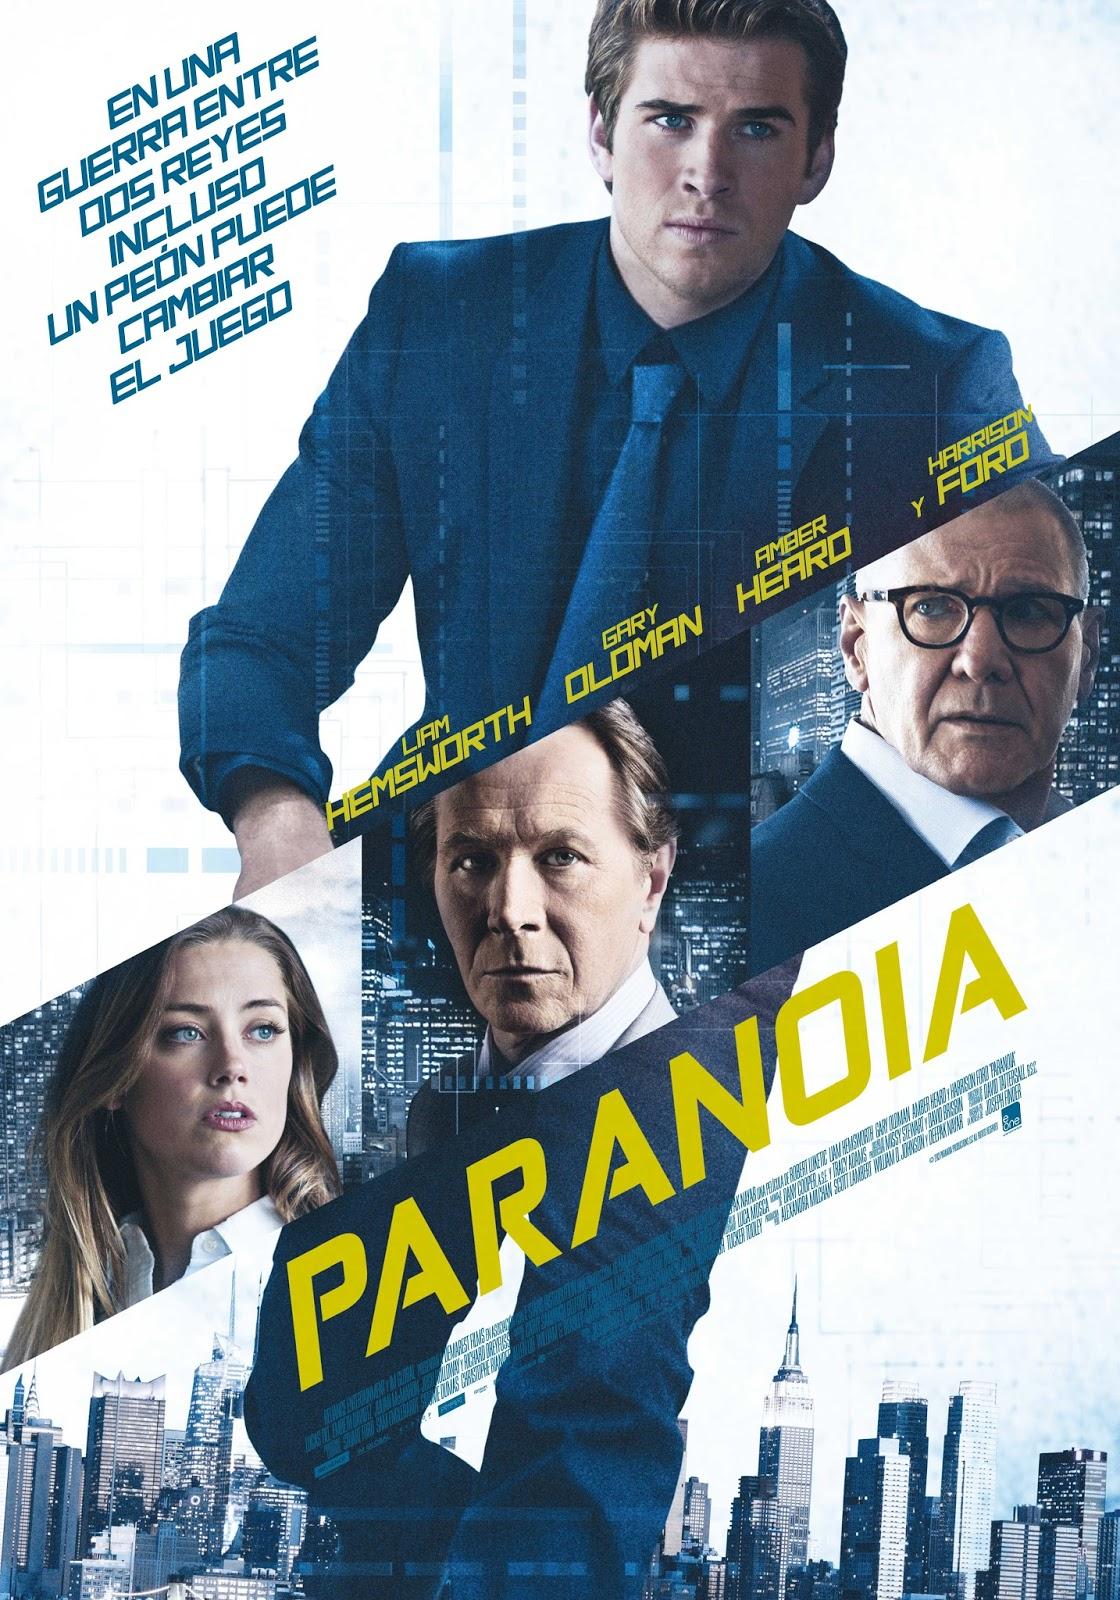 http://3.bp.blogspot.com/-1kvCL1zJVVI/UioQ3awWL4I/AAAAAAAAPKg/RhWcxVF8yxw/s1600/Paranoia_Poster_Oficial_Es_JPosters.jpg